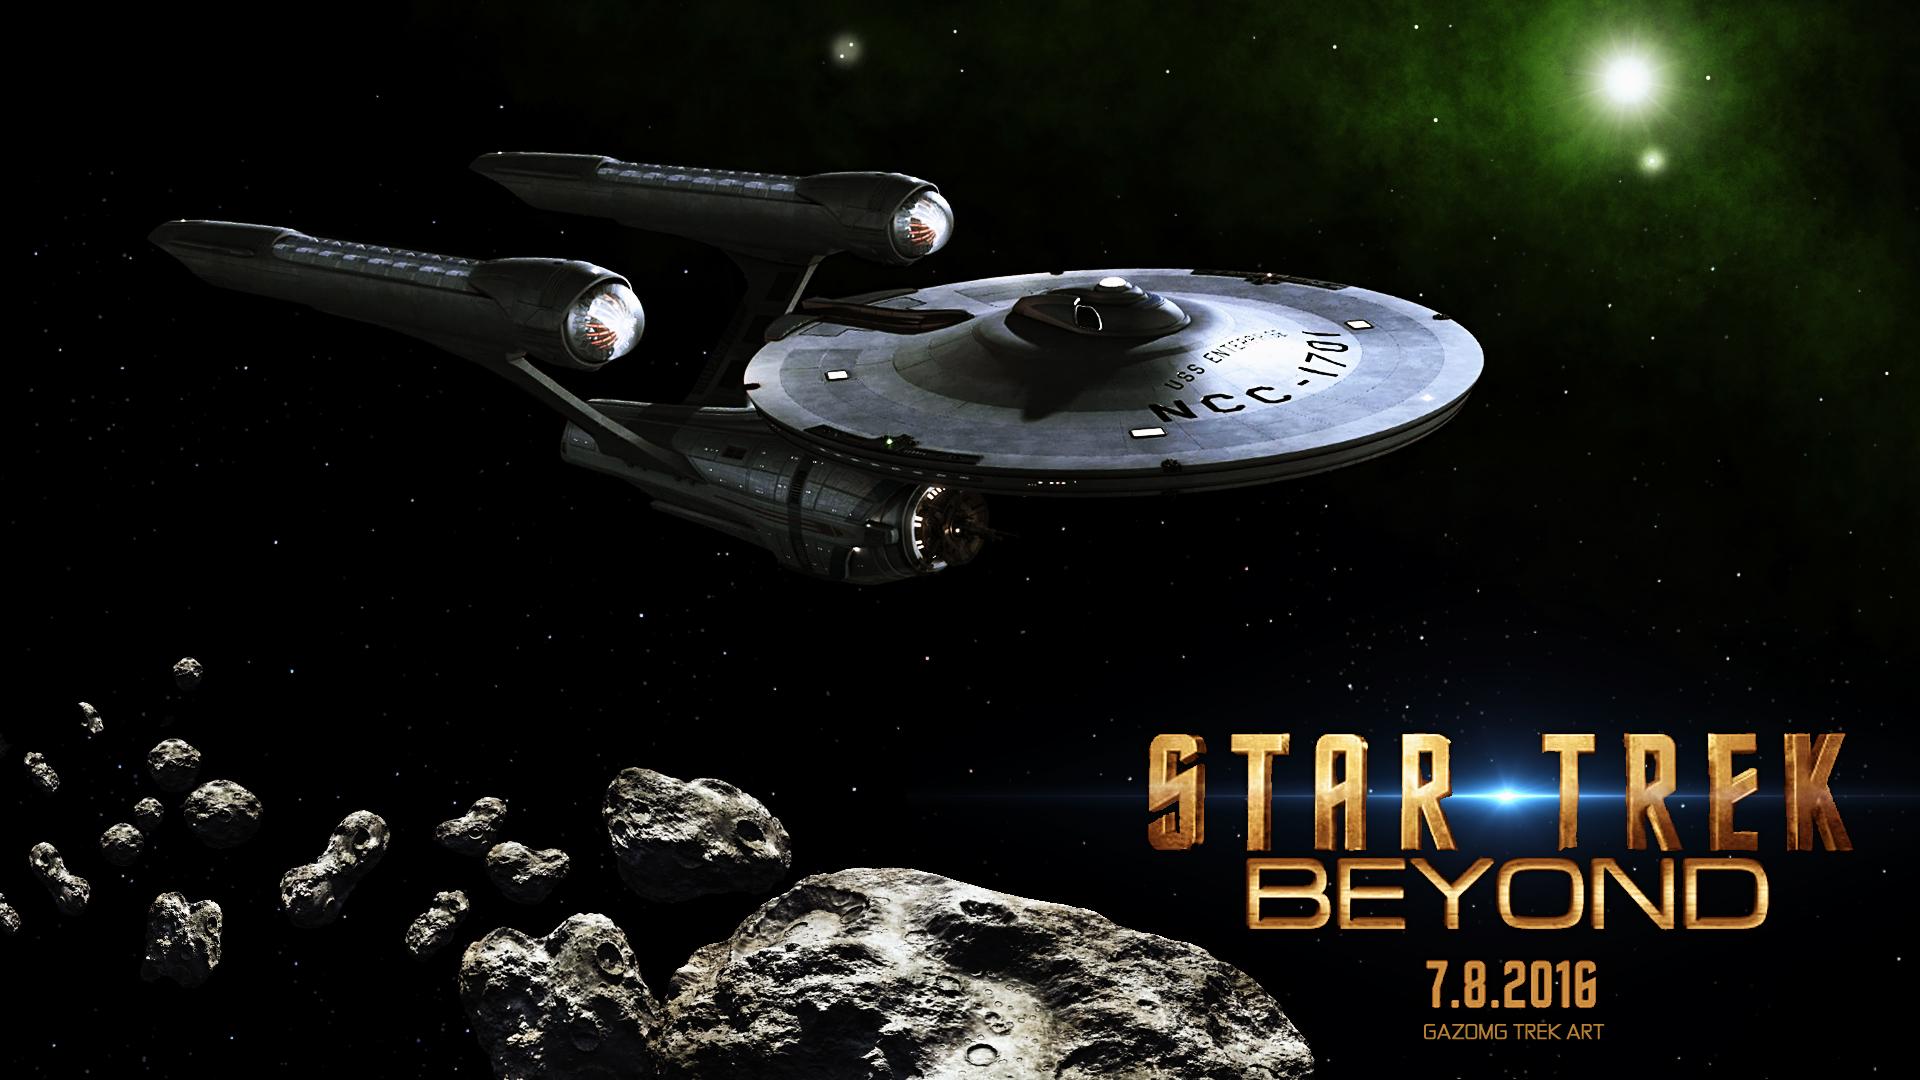 star trek beyond 1080p stream